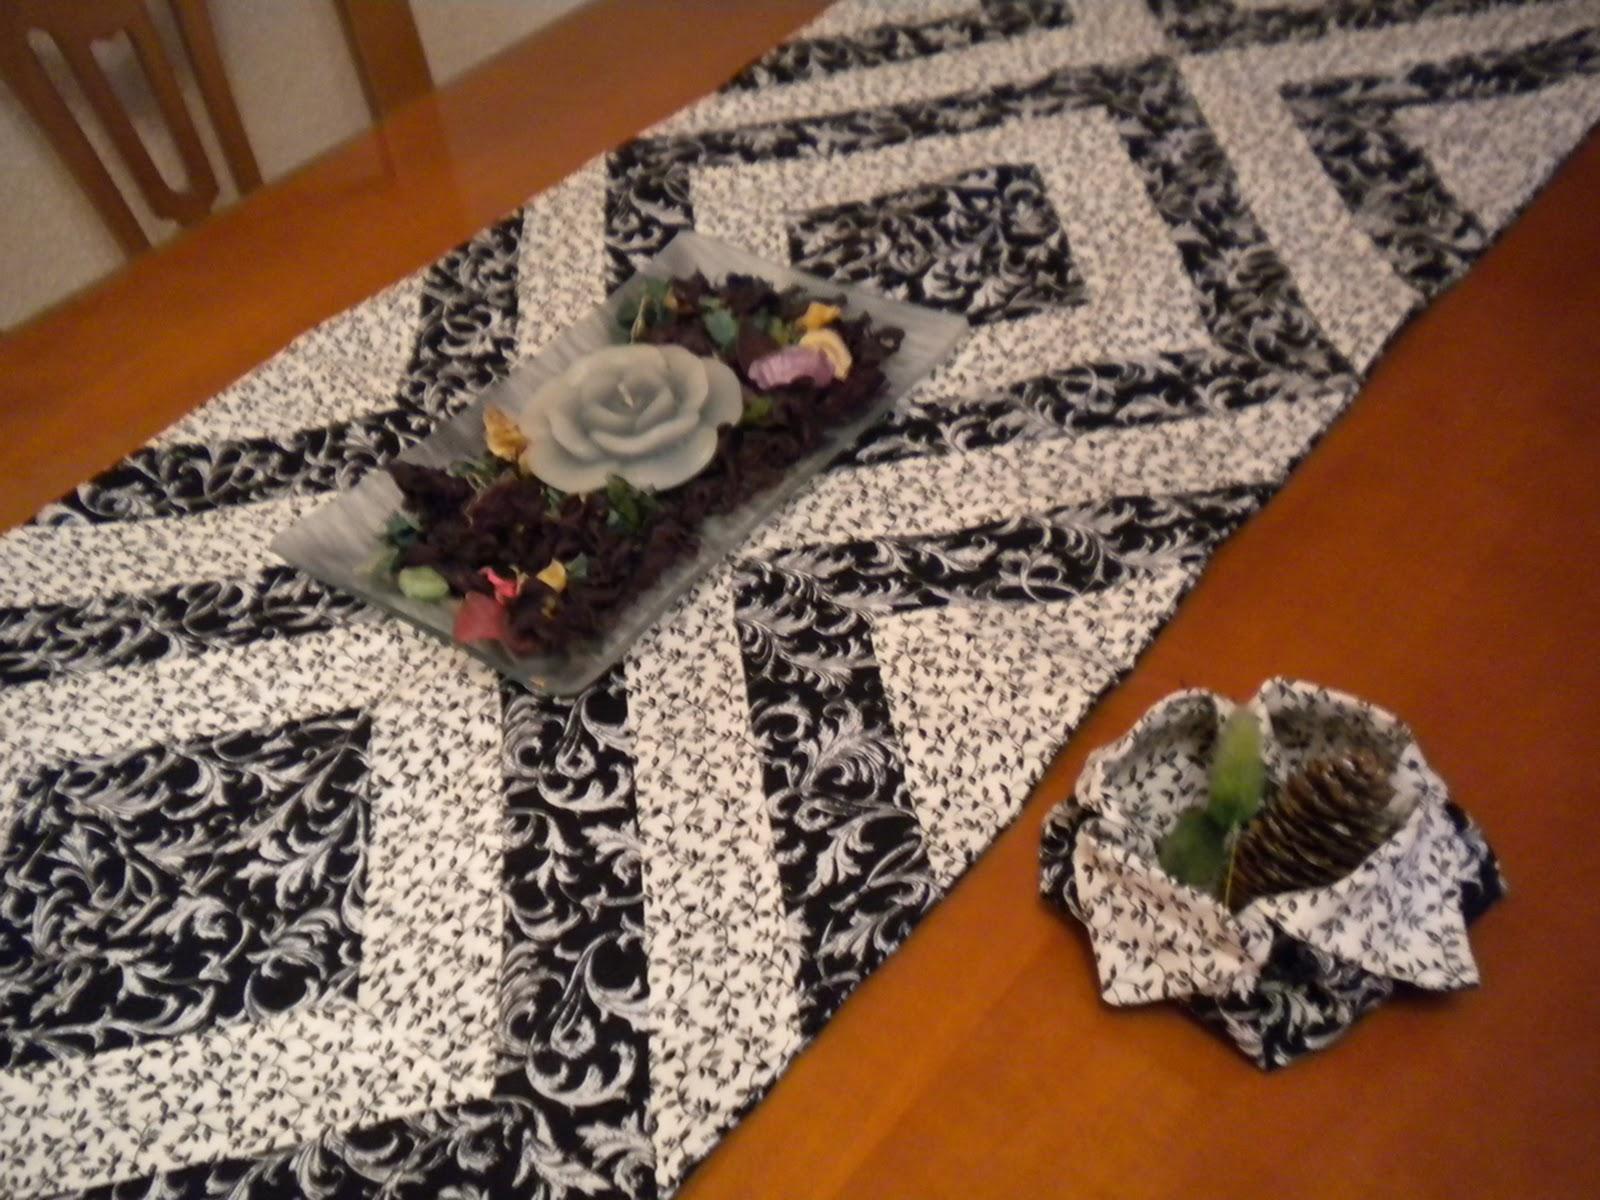 Camino de mesa de patchwork el blog de margarita - Camino mesa patchwork ...